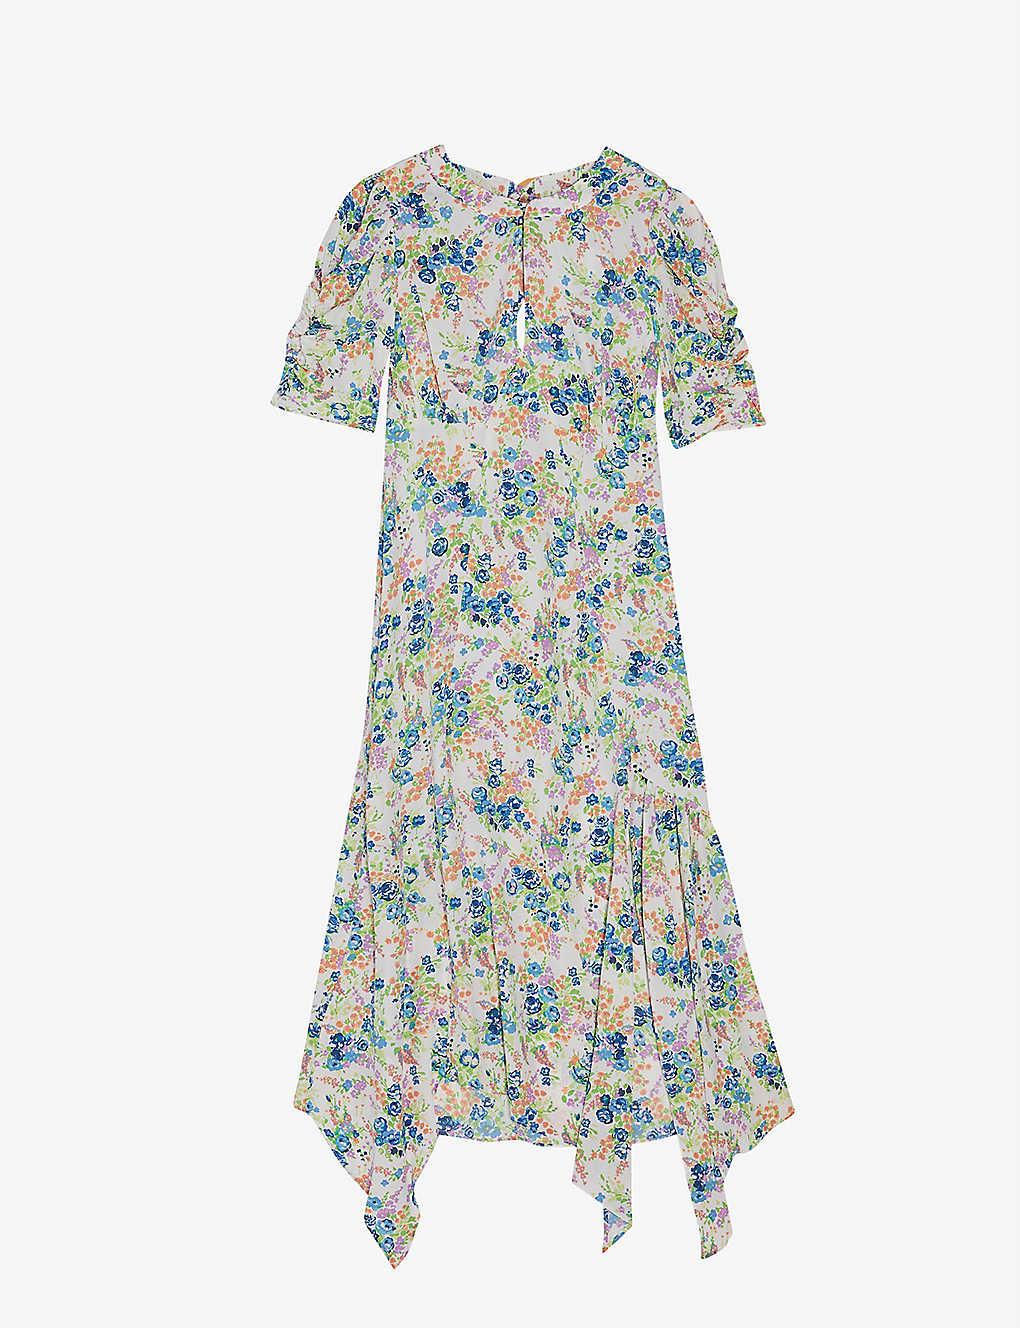 TOPSHOP Floral Print Crepe Midi Dress